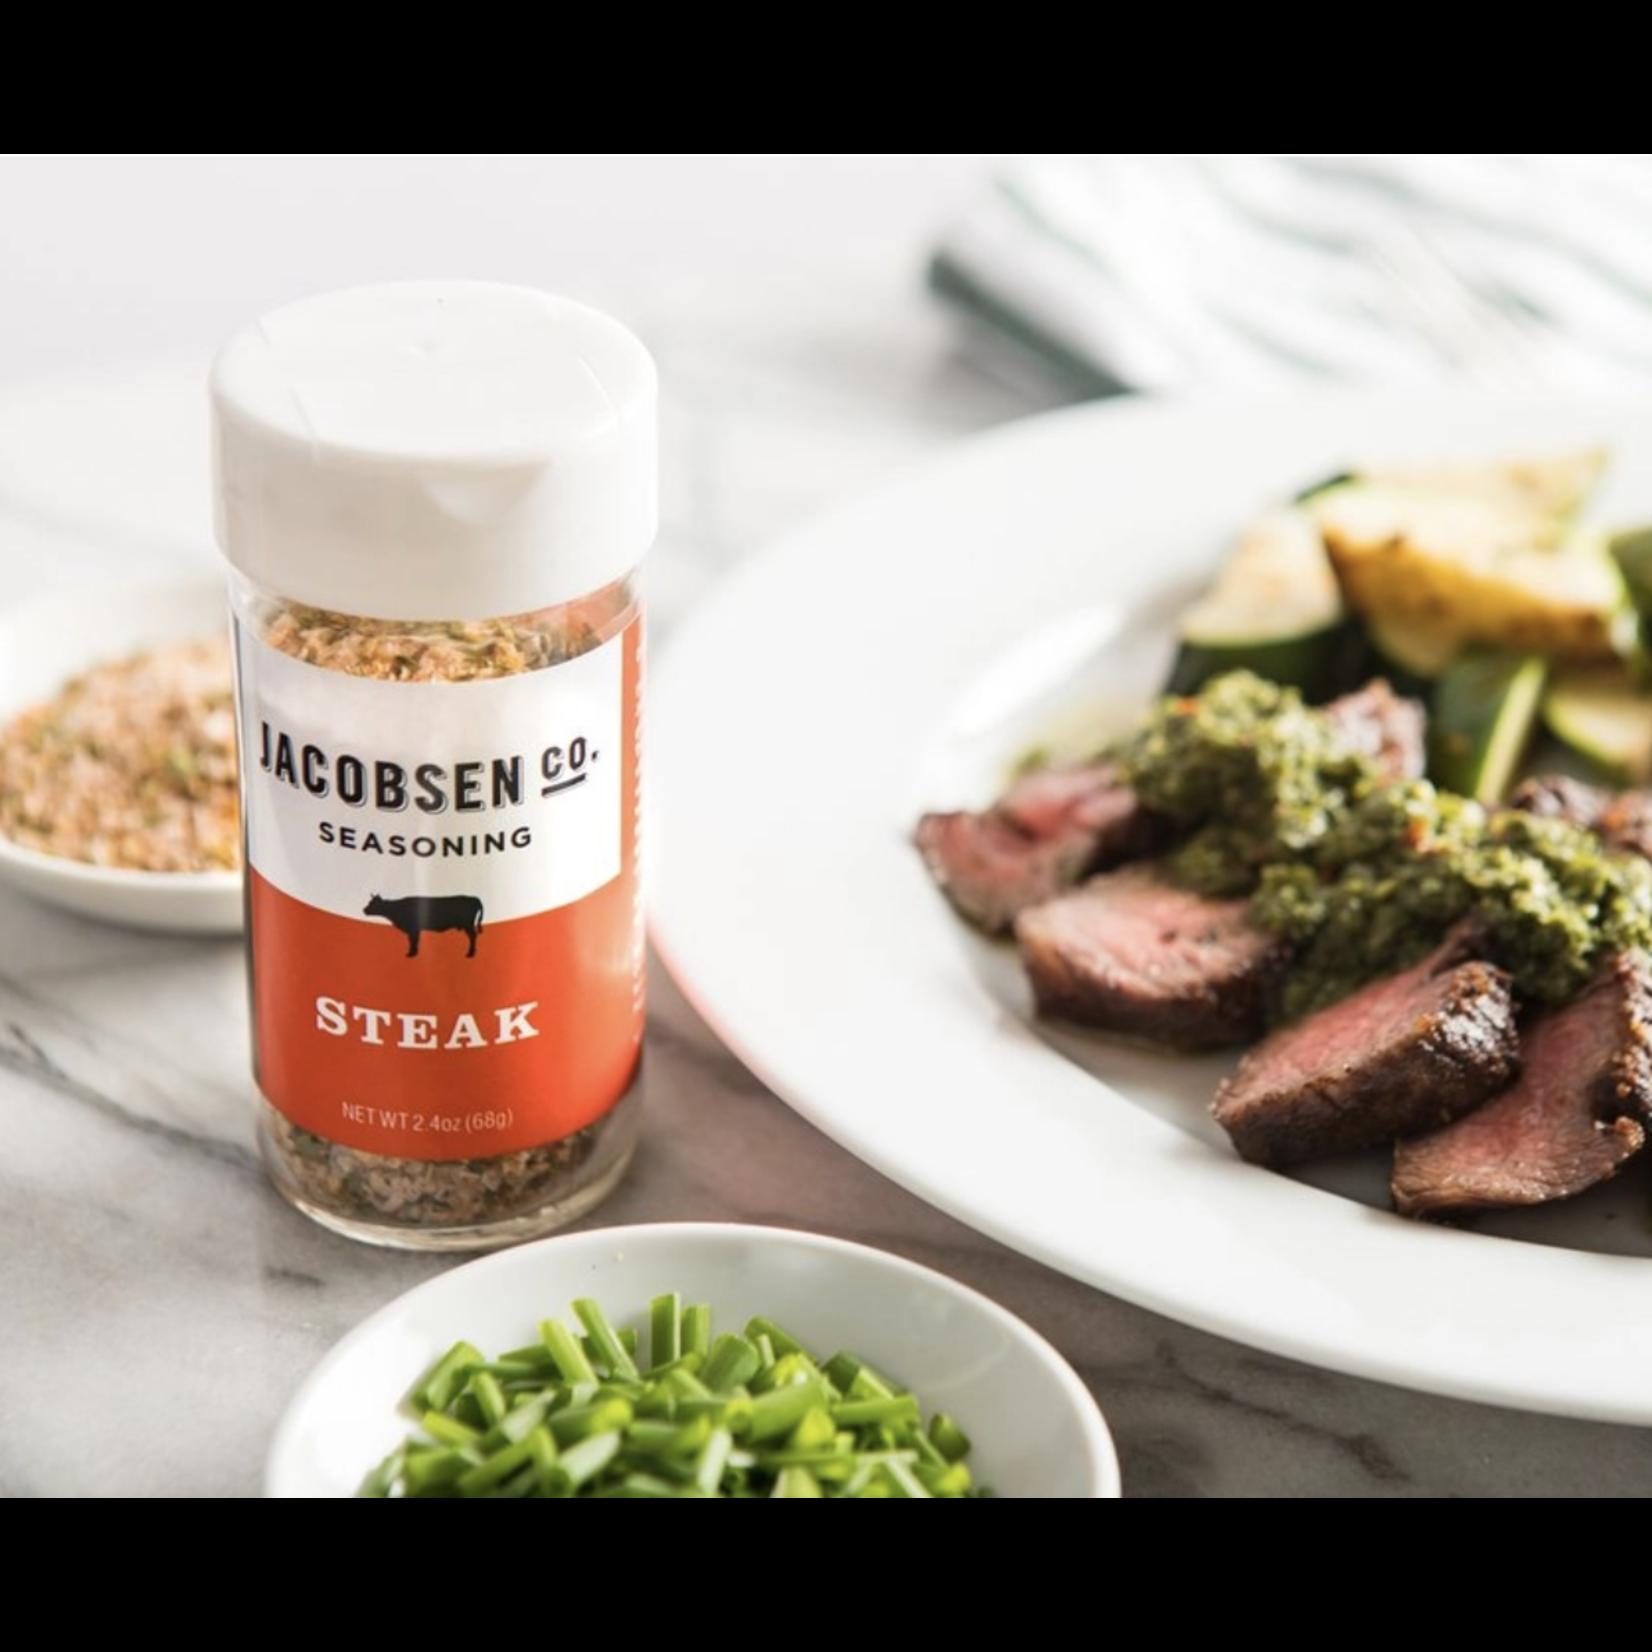 Jacobsen Salt Co. Steak 2.4oz Seasoning